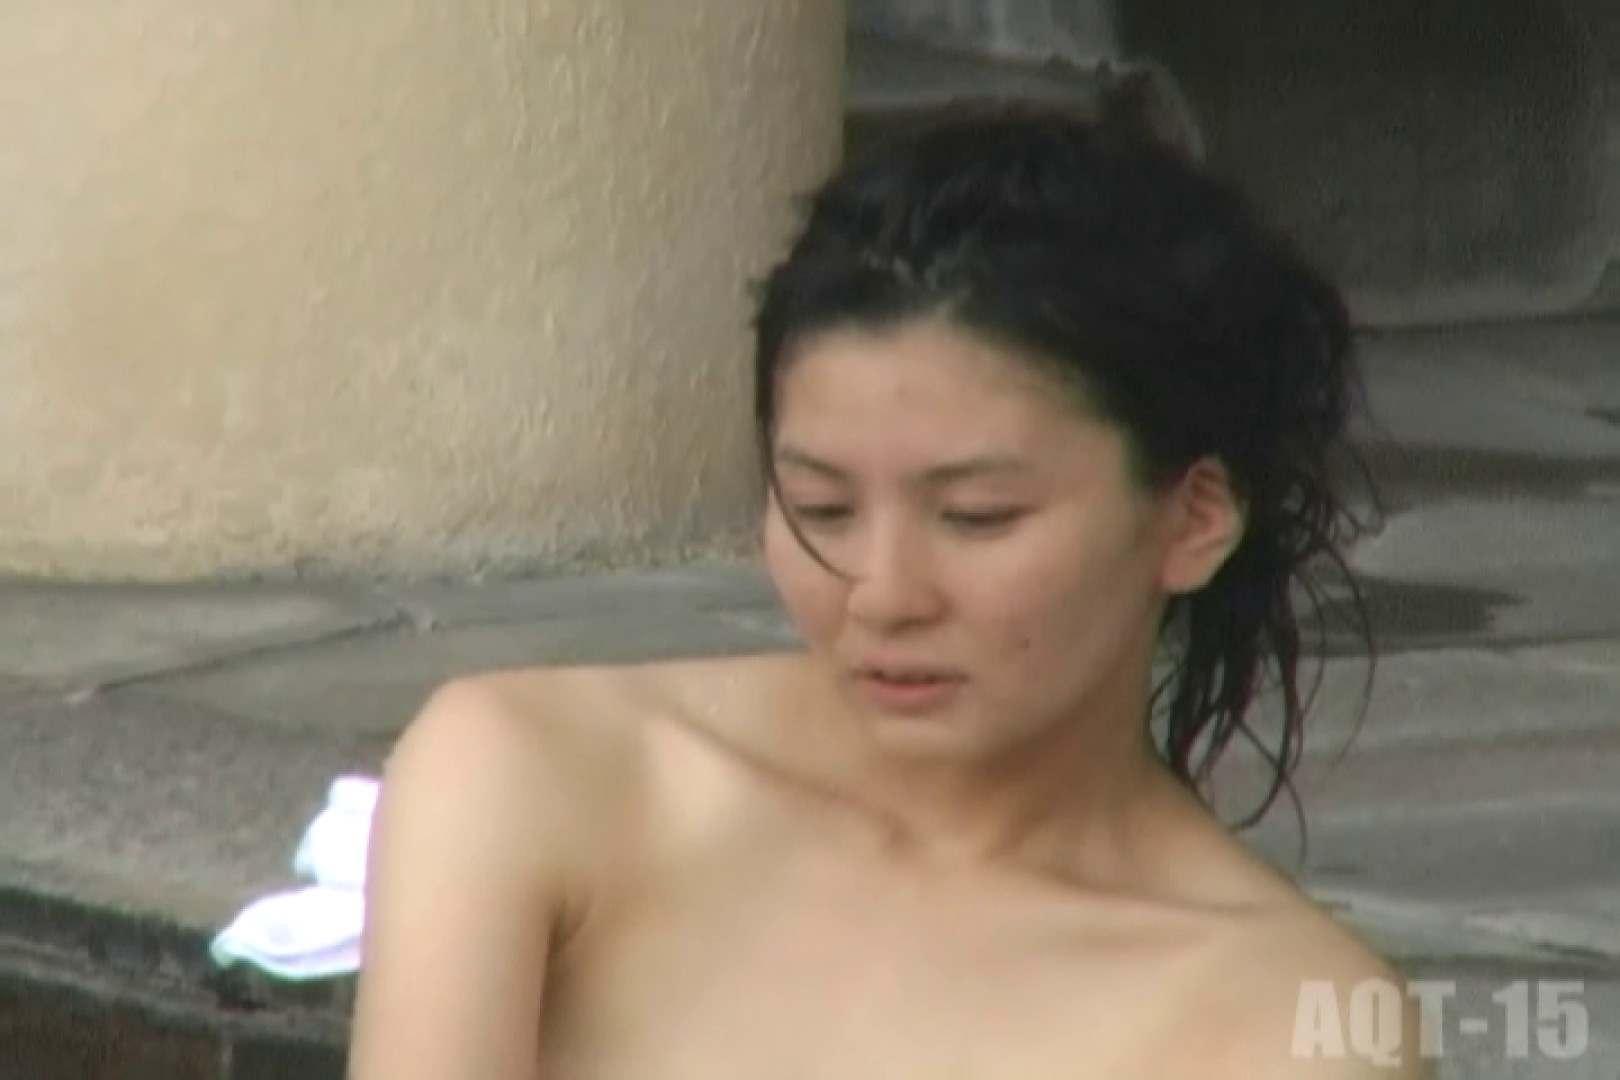 Aquaな露天風呂Vol.832 露天風呂編  108PIX 50